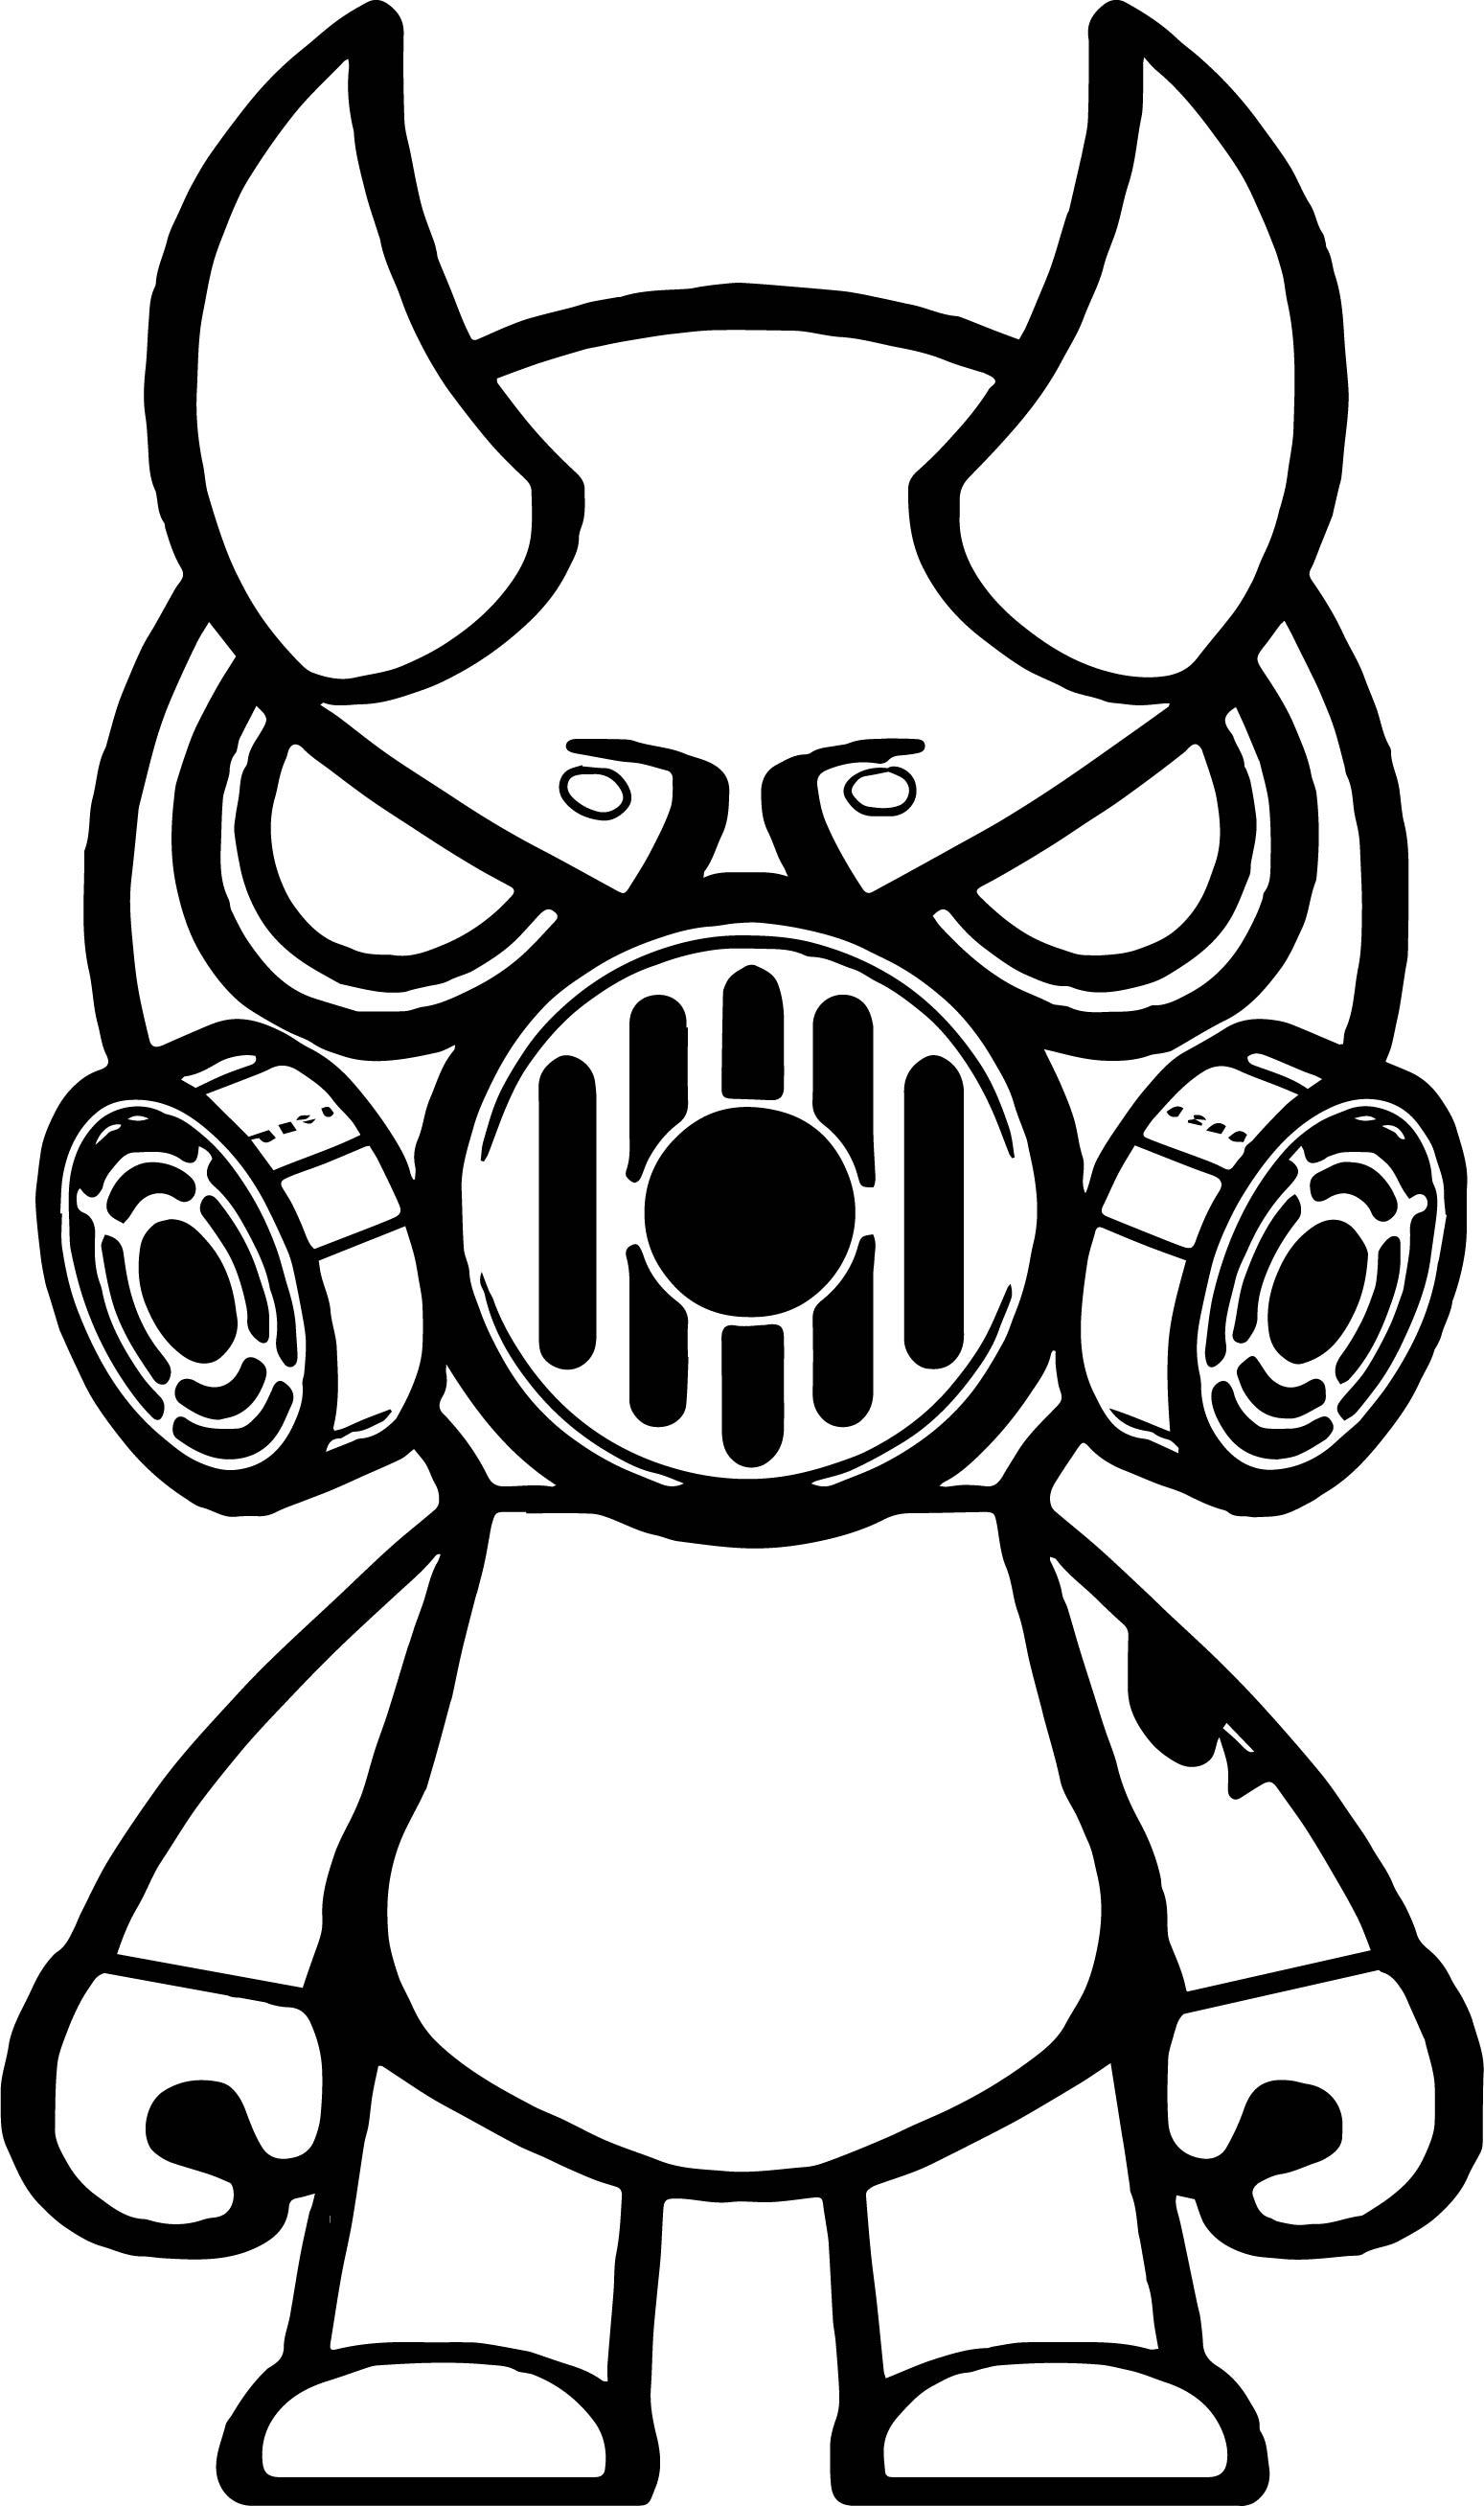 Gas Mask Oni Black Mask Coloring Page Wecoloringpage Com